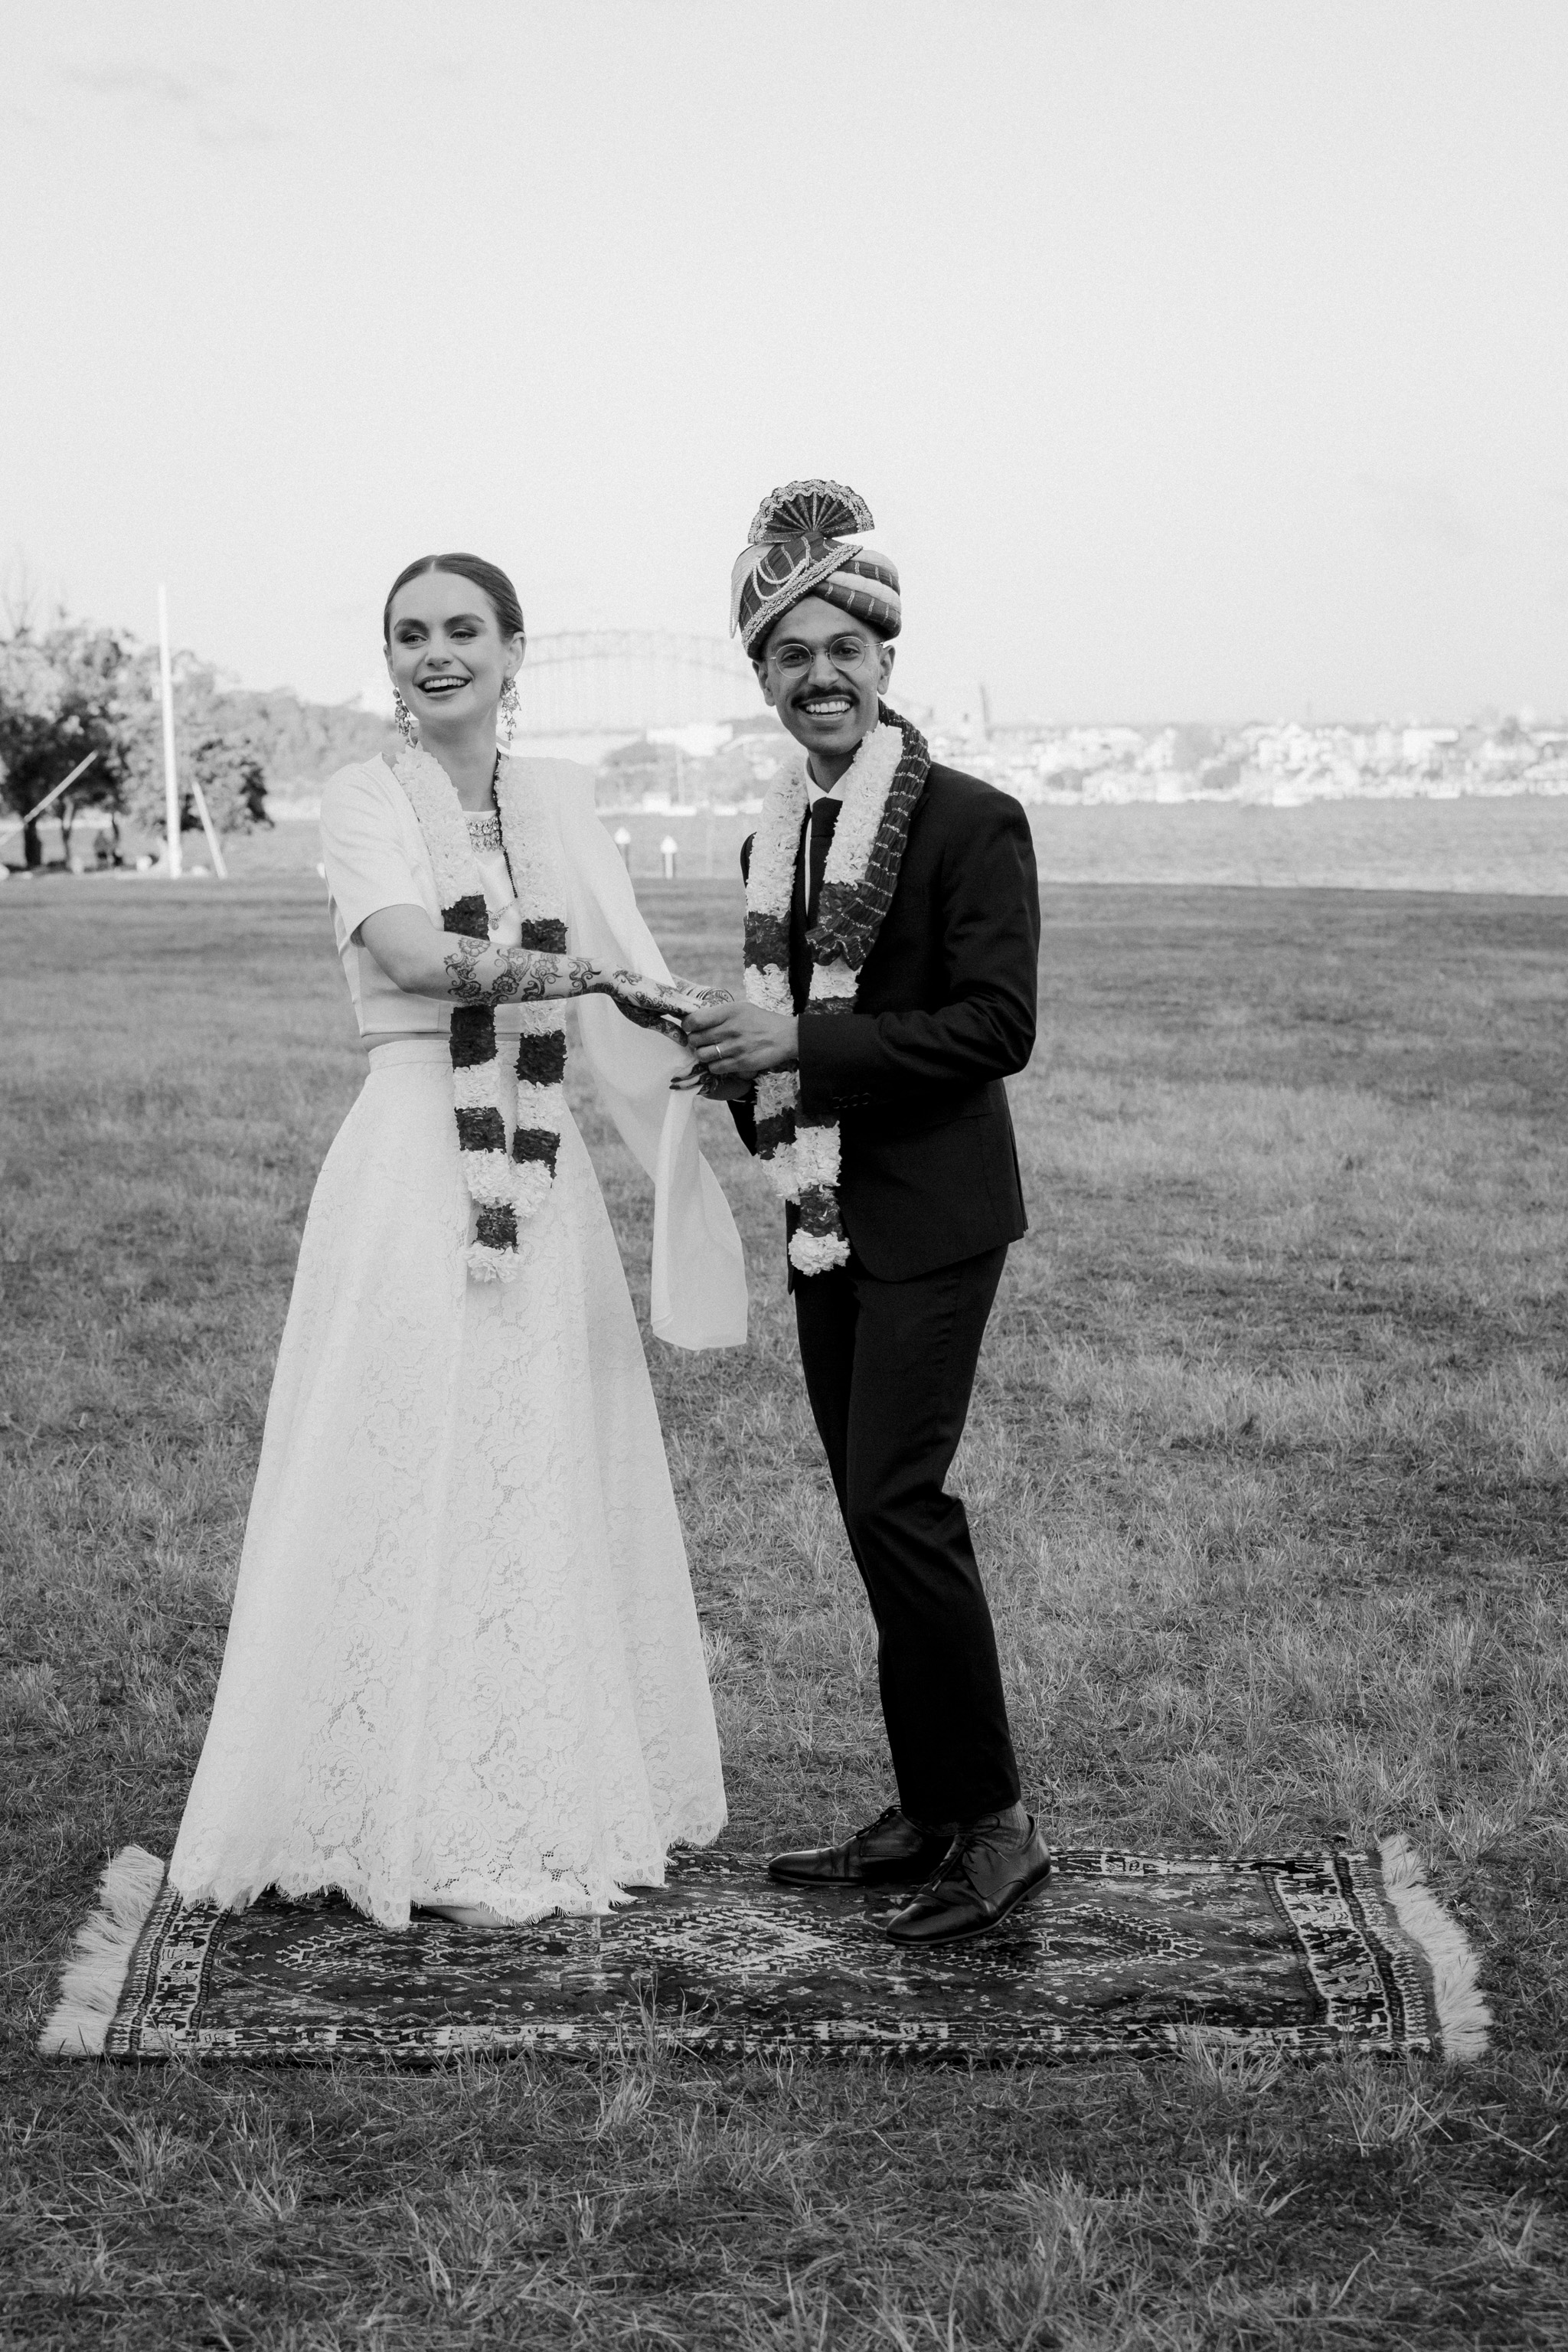 Amelia+Ani_Wedding_May2019_credit_OneDaySomewherePhotography-69.jpg